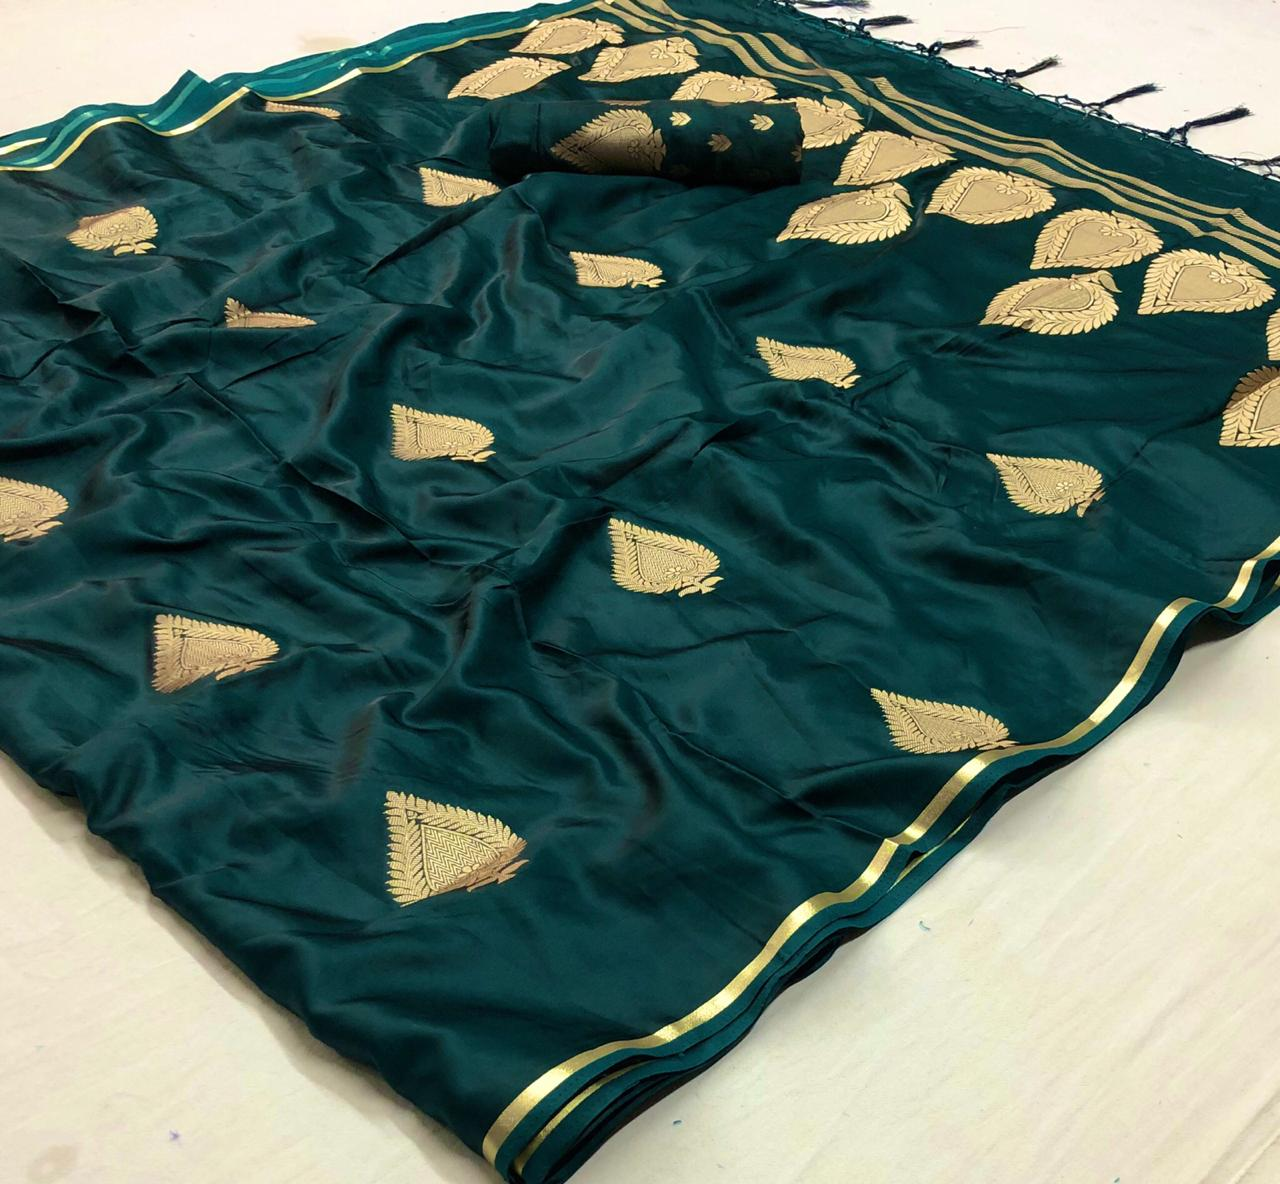 Party Wear Jade Green Soft Silk Sarees Below 3000 Online